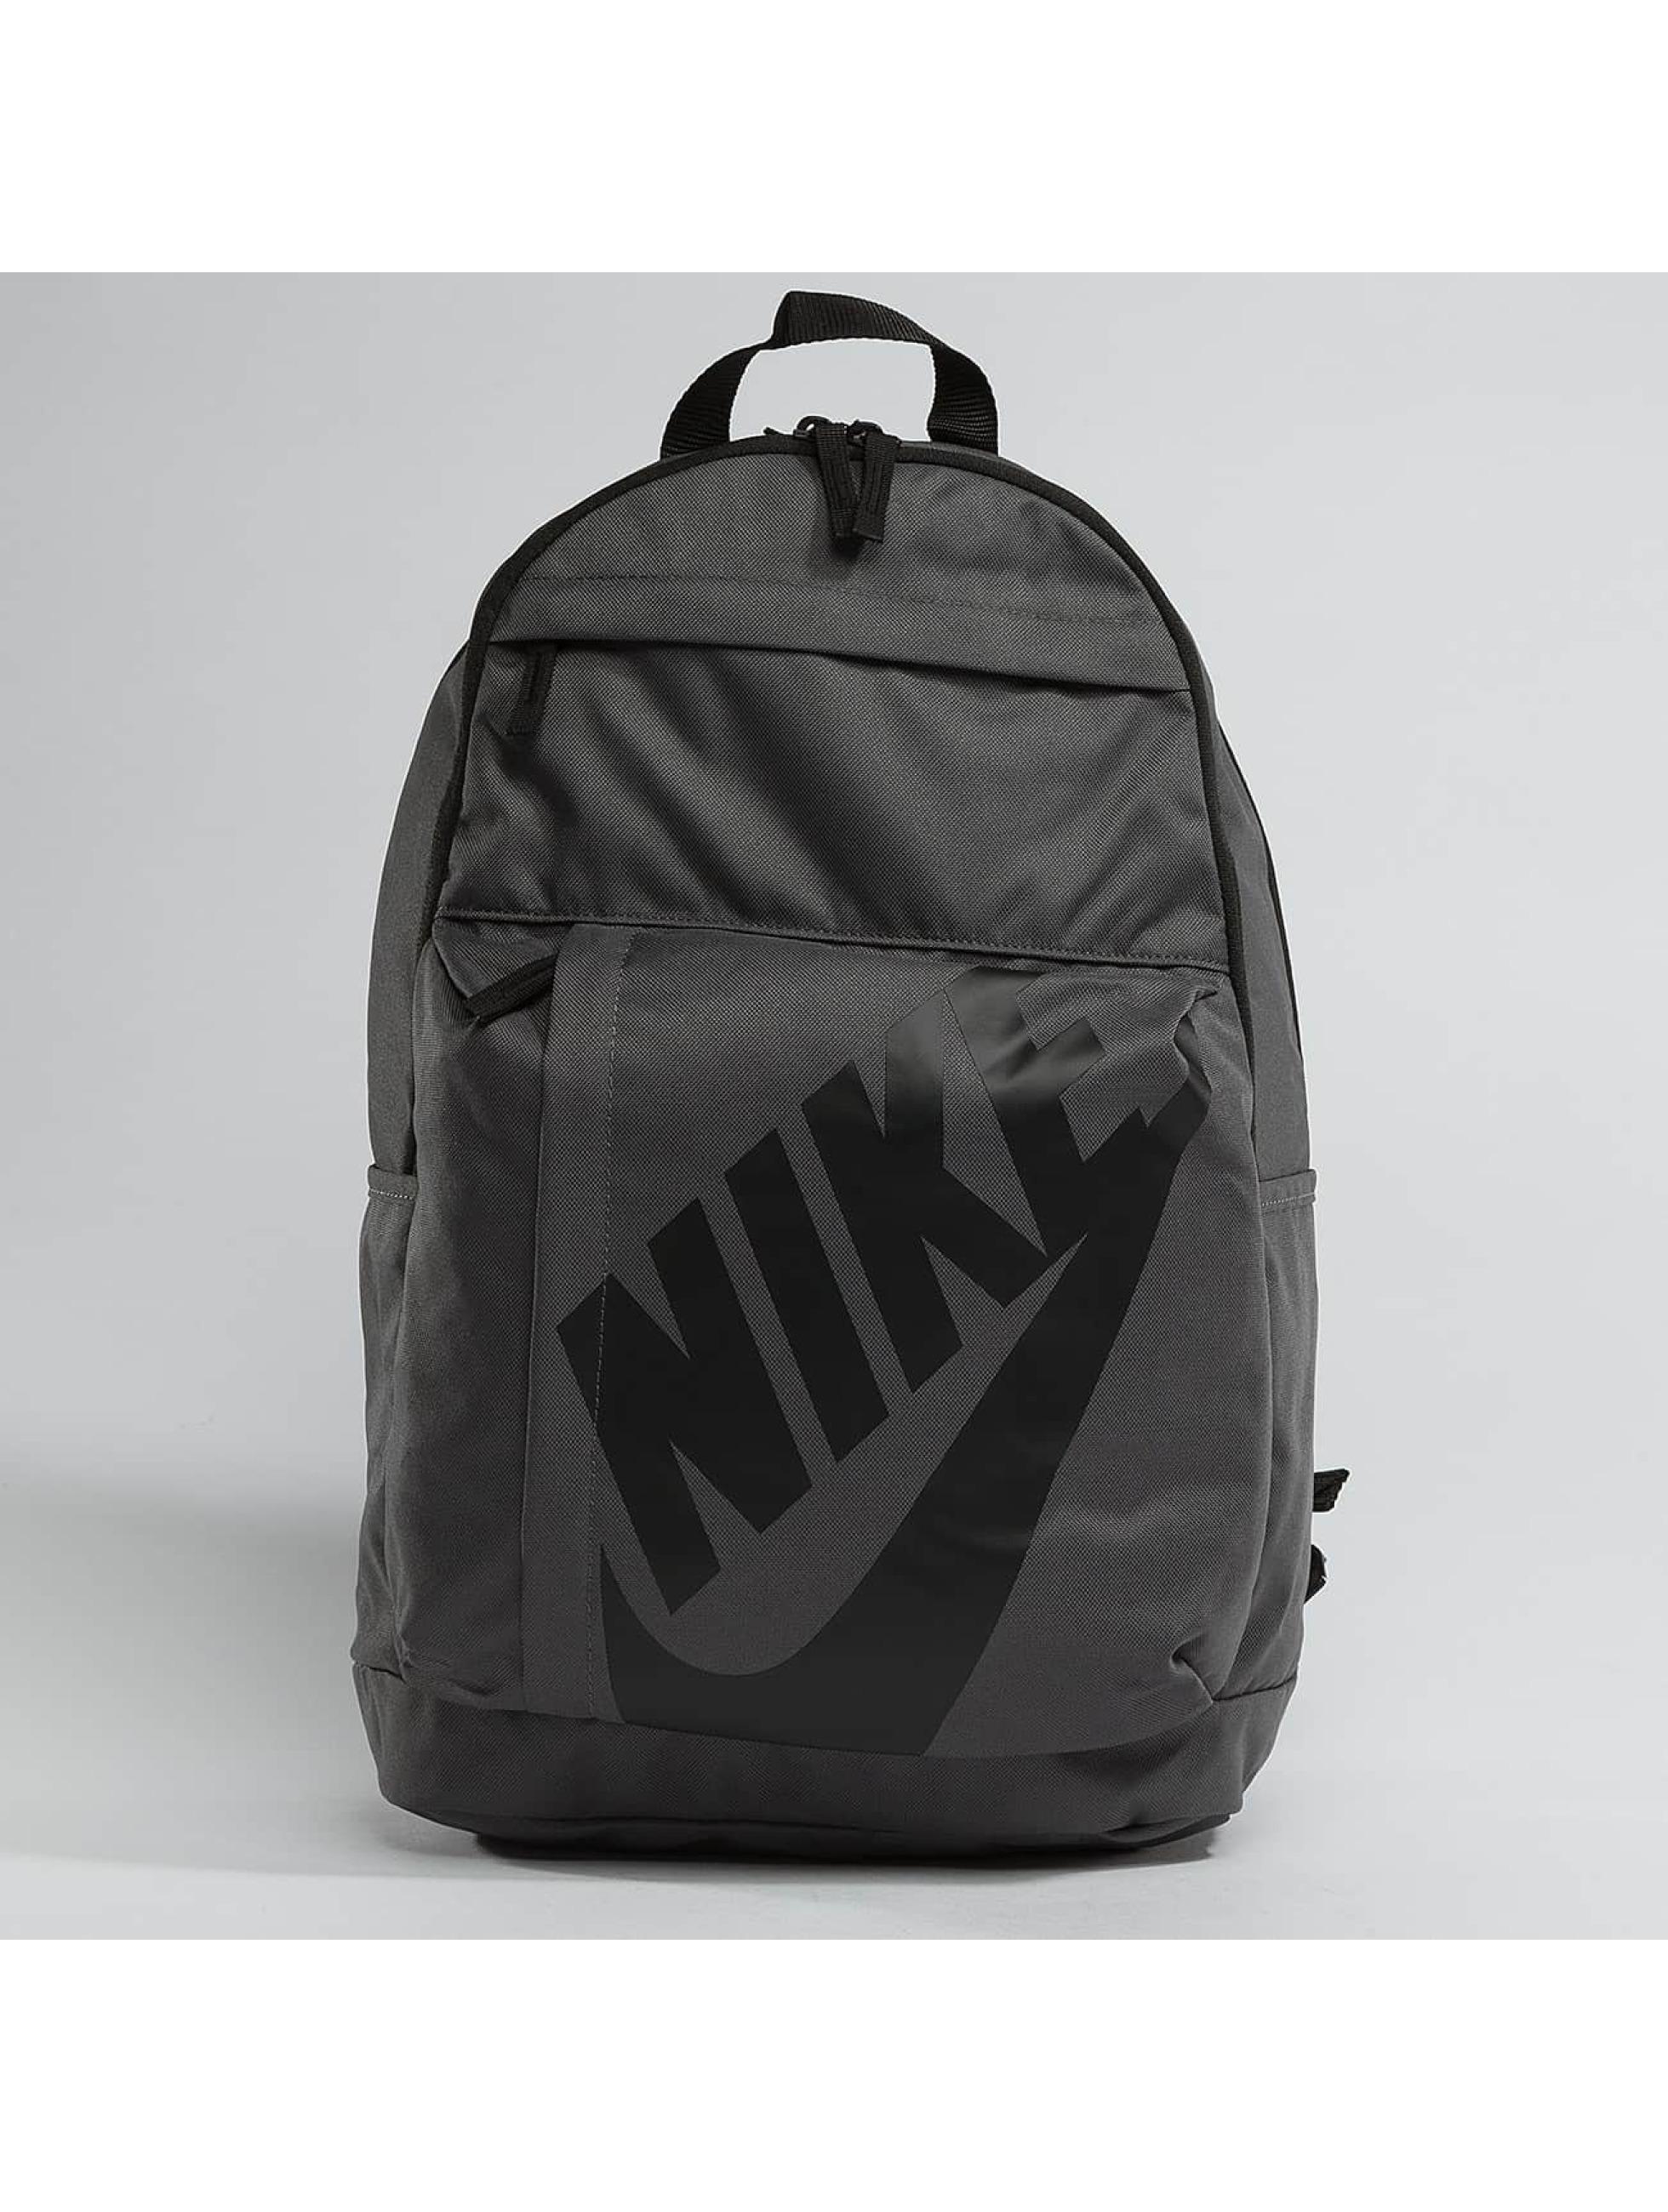 Nike Männer,Frauen Rucksack Elemental in grau